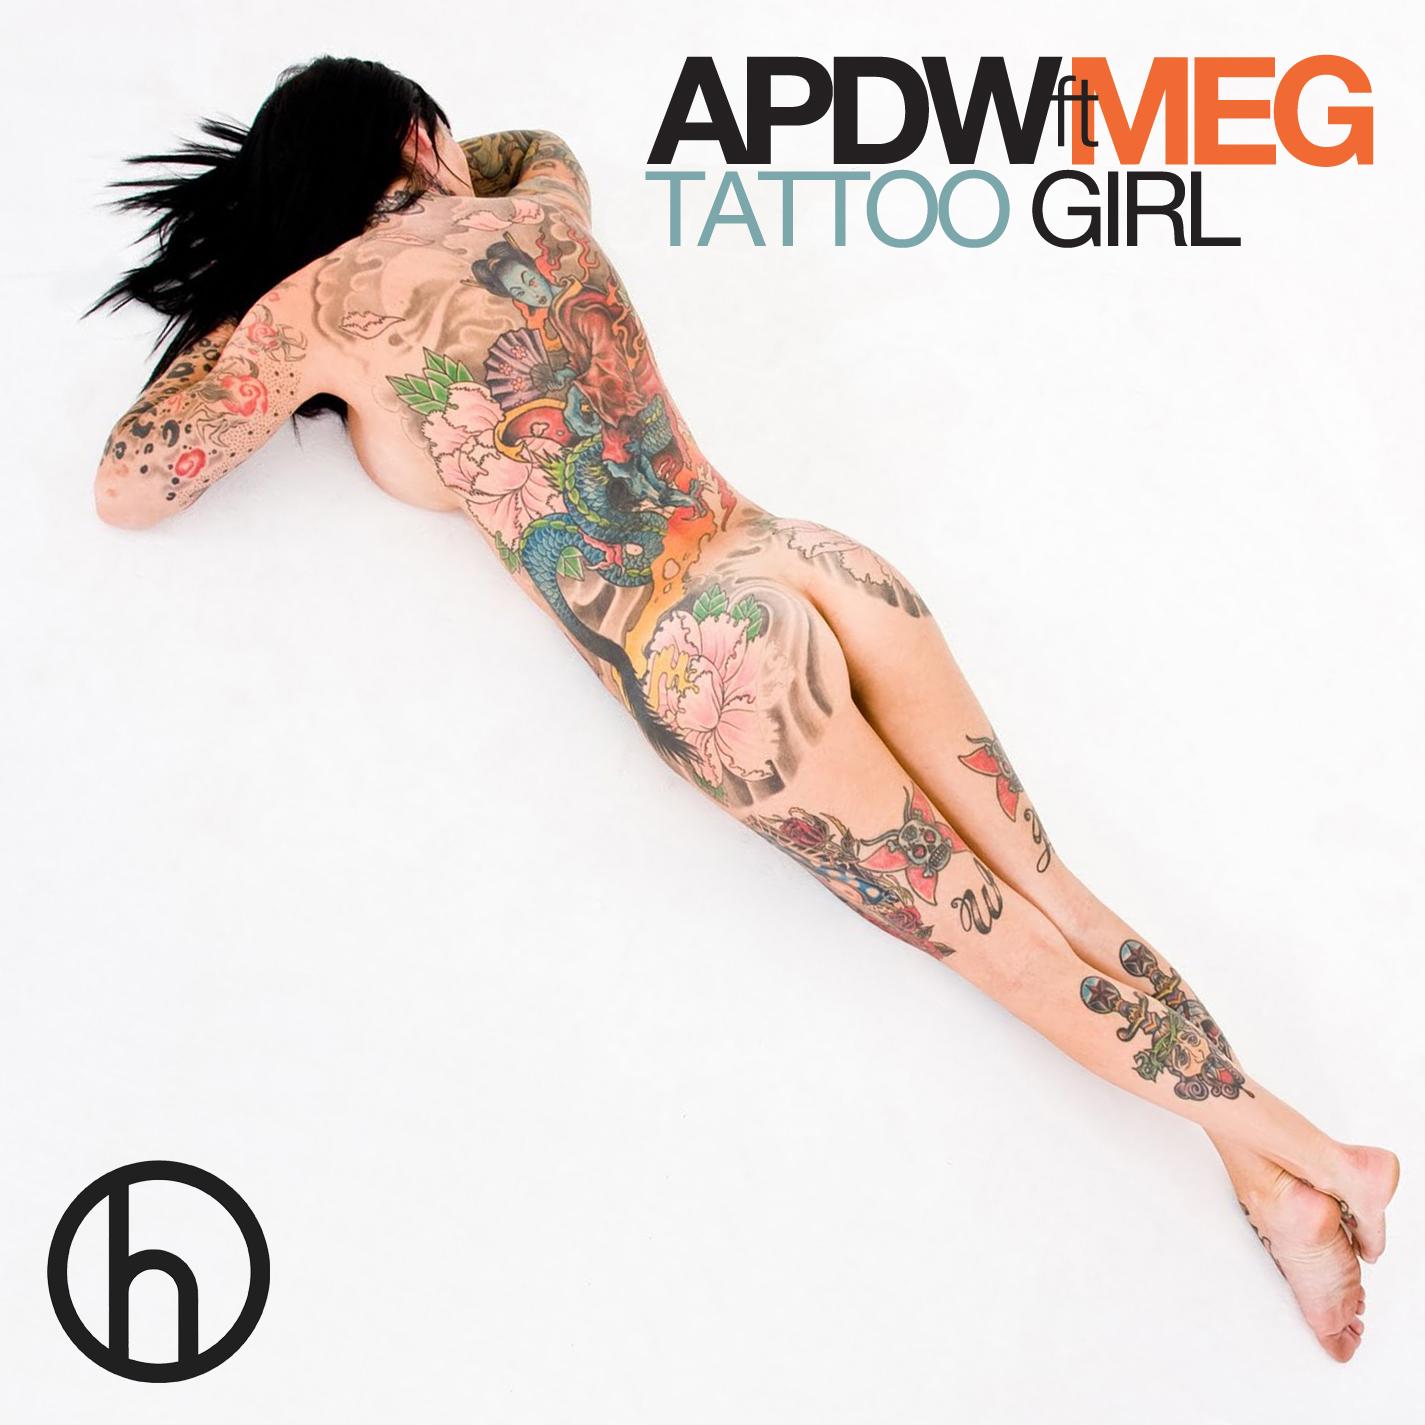 http://4.bp.blogspot.com/-G5GUyVycsvI/UGNQjMcIBBI/AAAAAAAABL0/pkN5r-MnDOY/s1600/Tattoo+Girl+APDW.jpeg